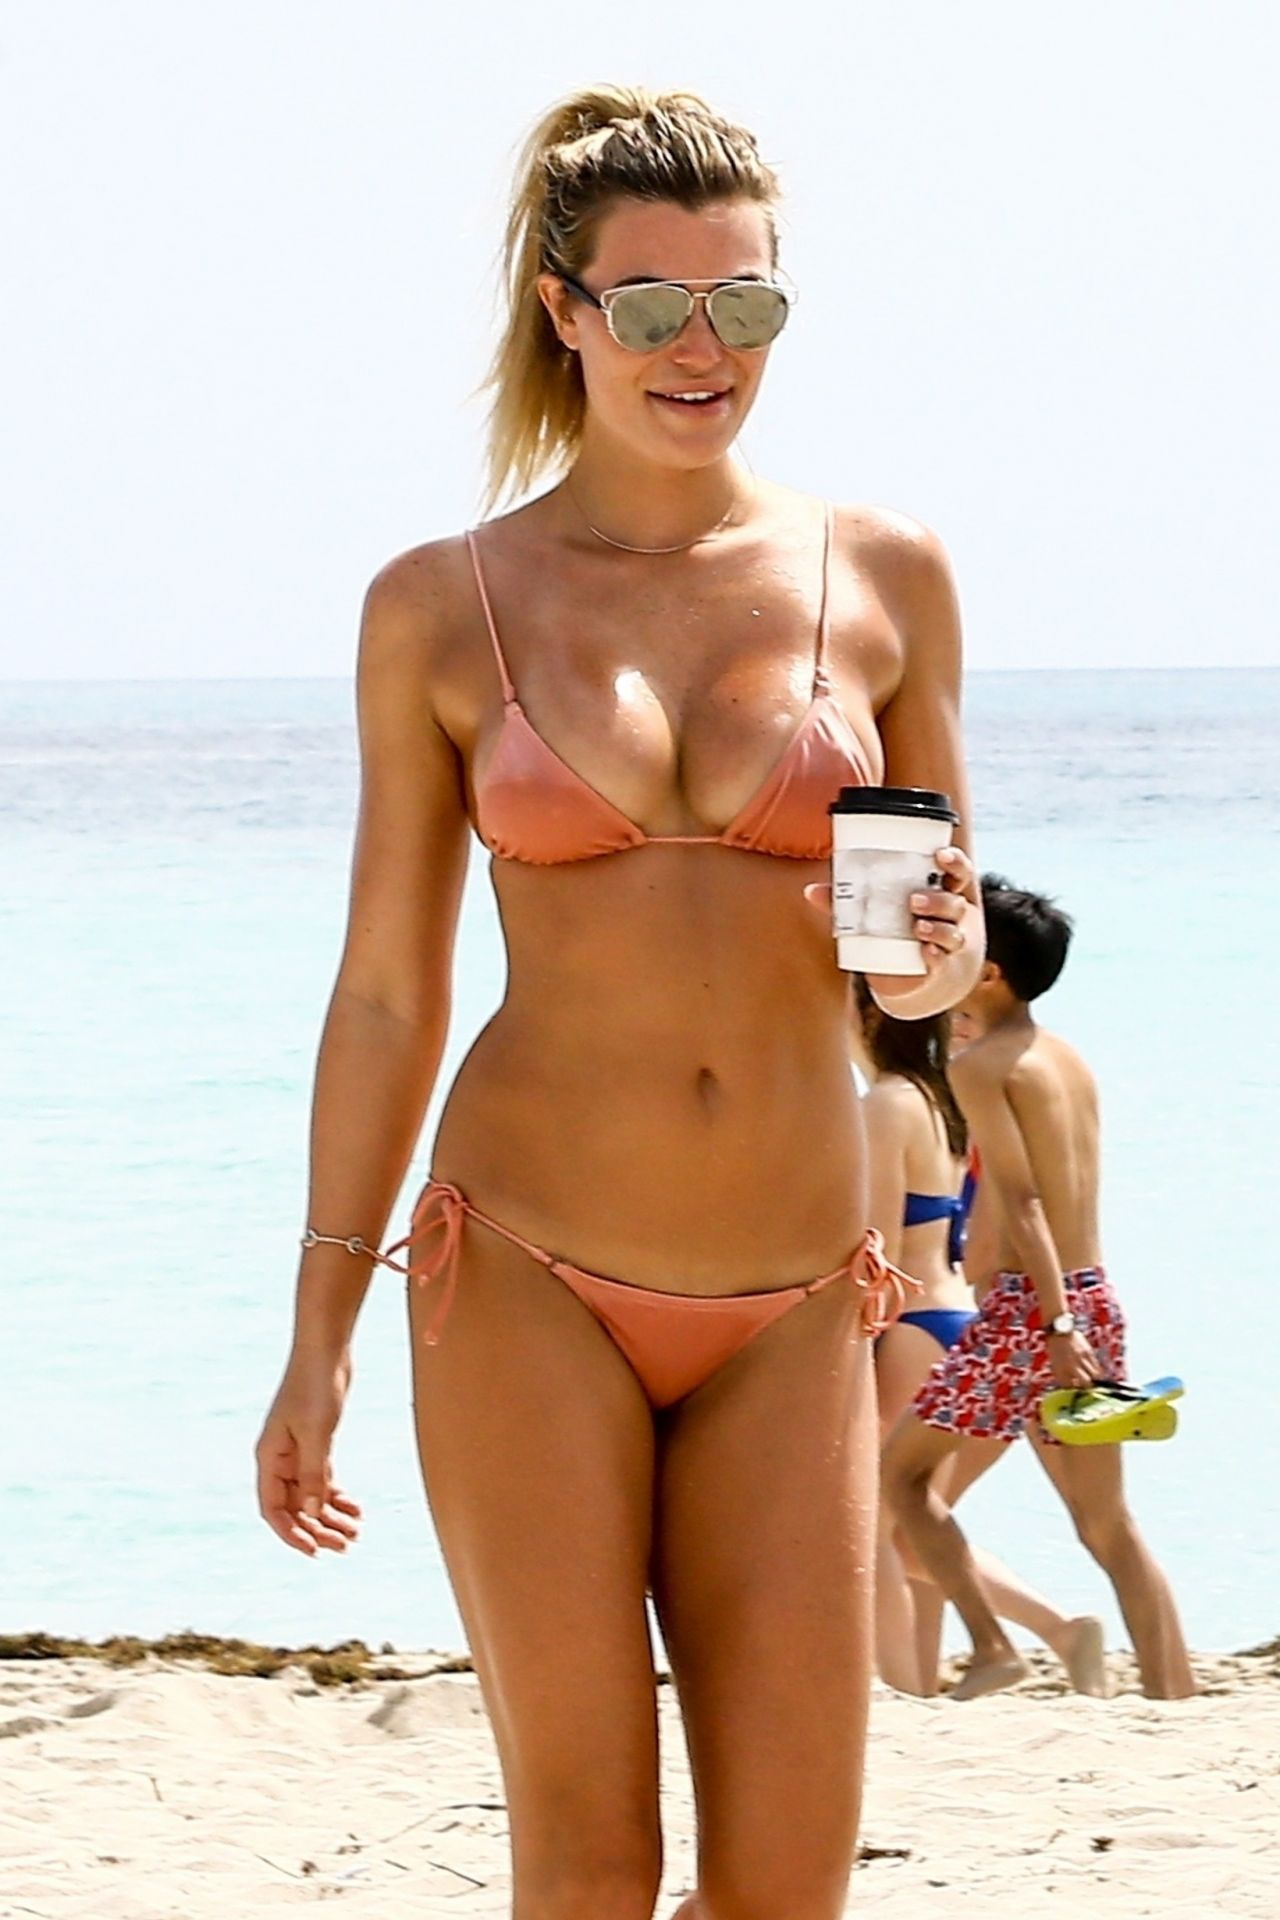 Samantha Hoopes In A Pink Bikini On The Beach In Miami 03 -4214